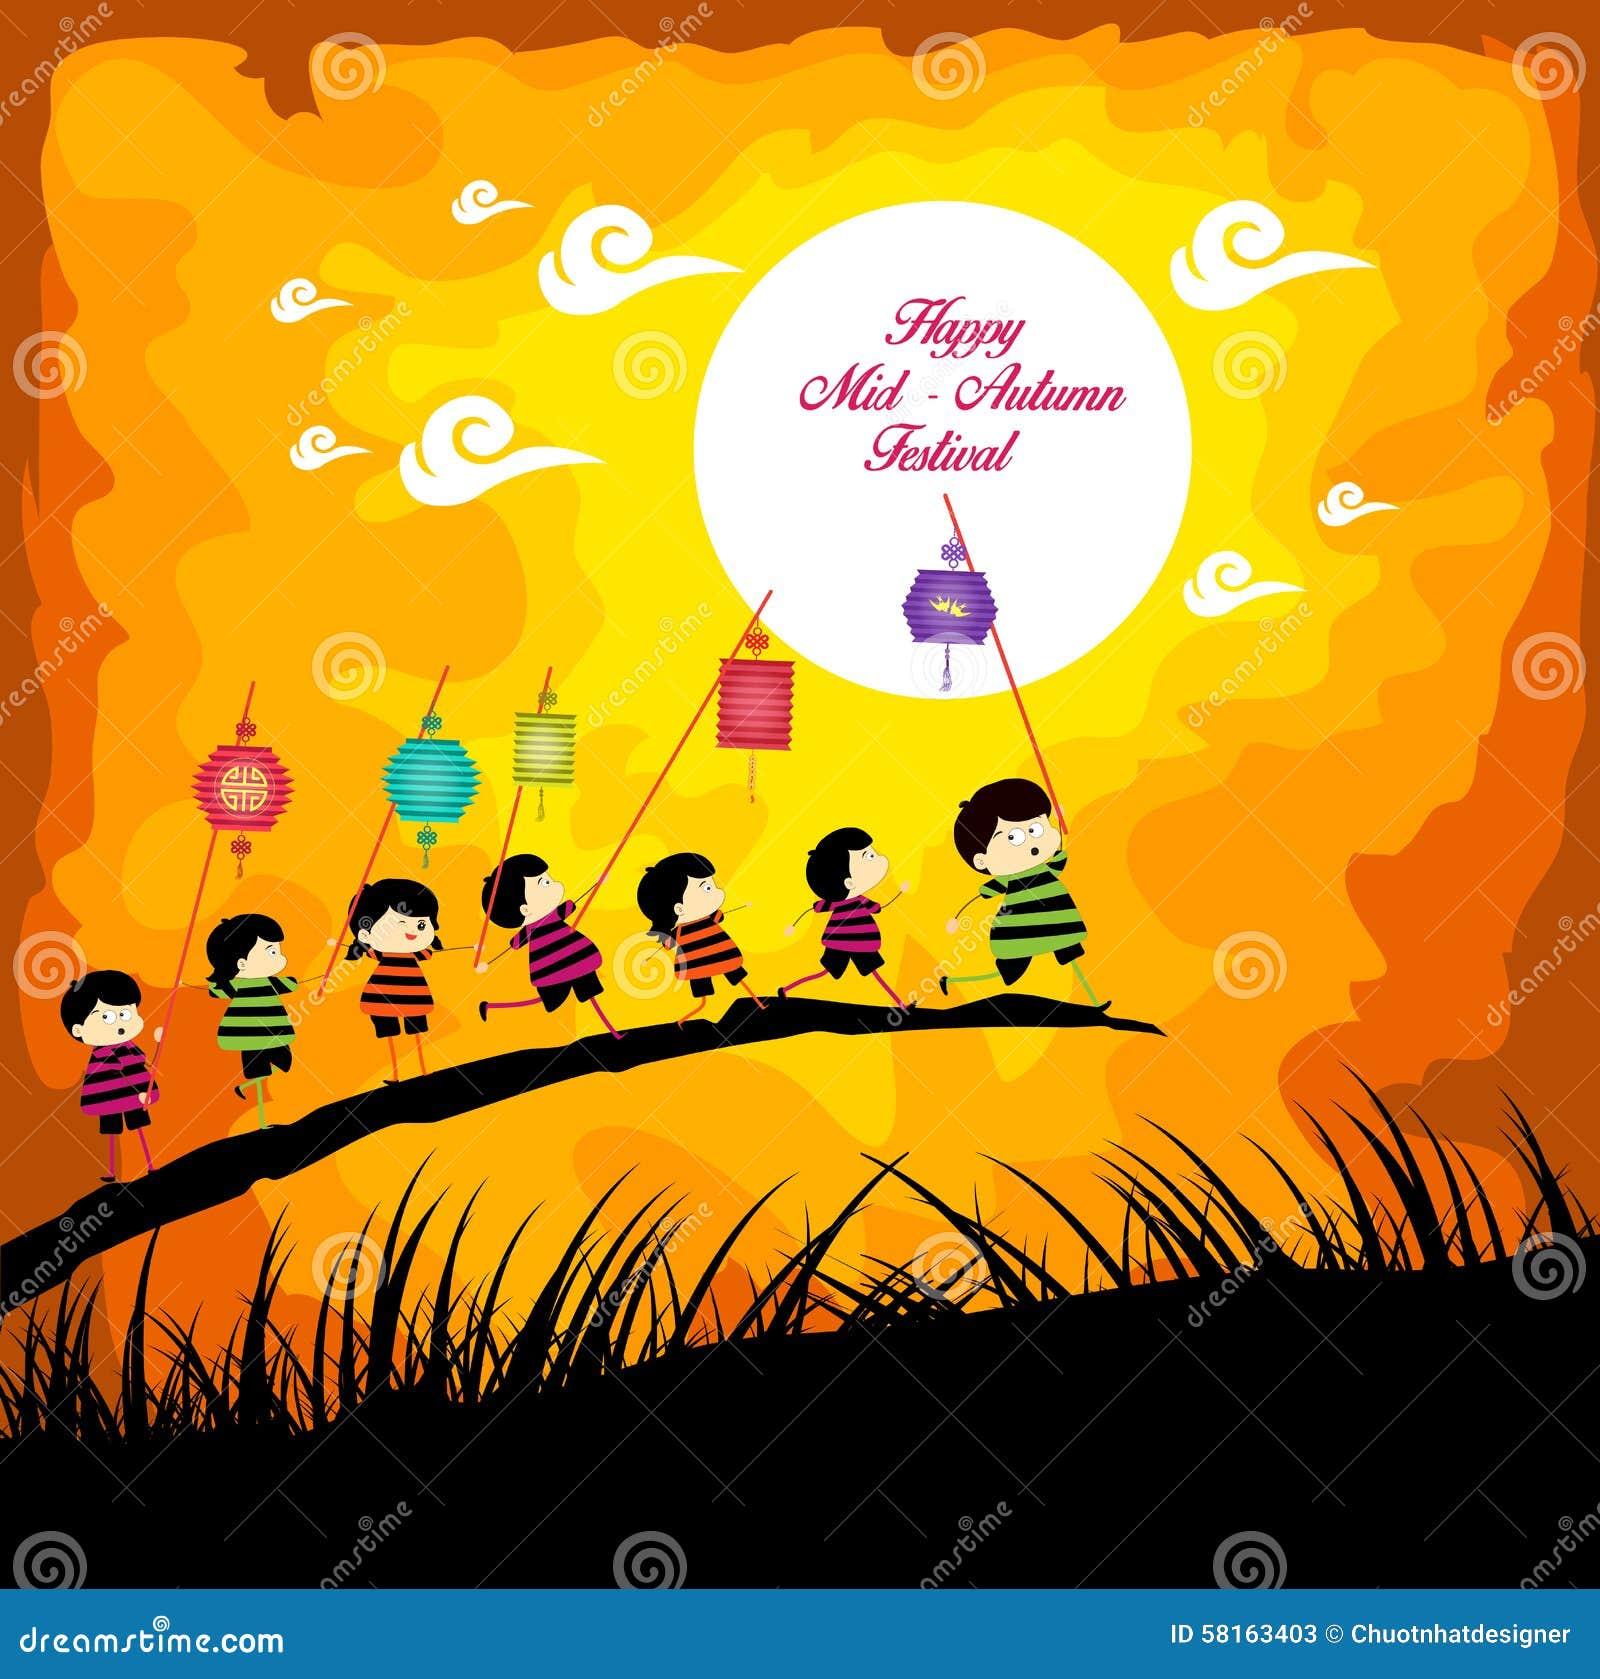 Mid Autumn Festival Stock Vector - Image: 51868705